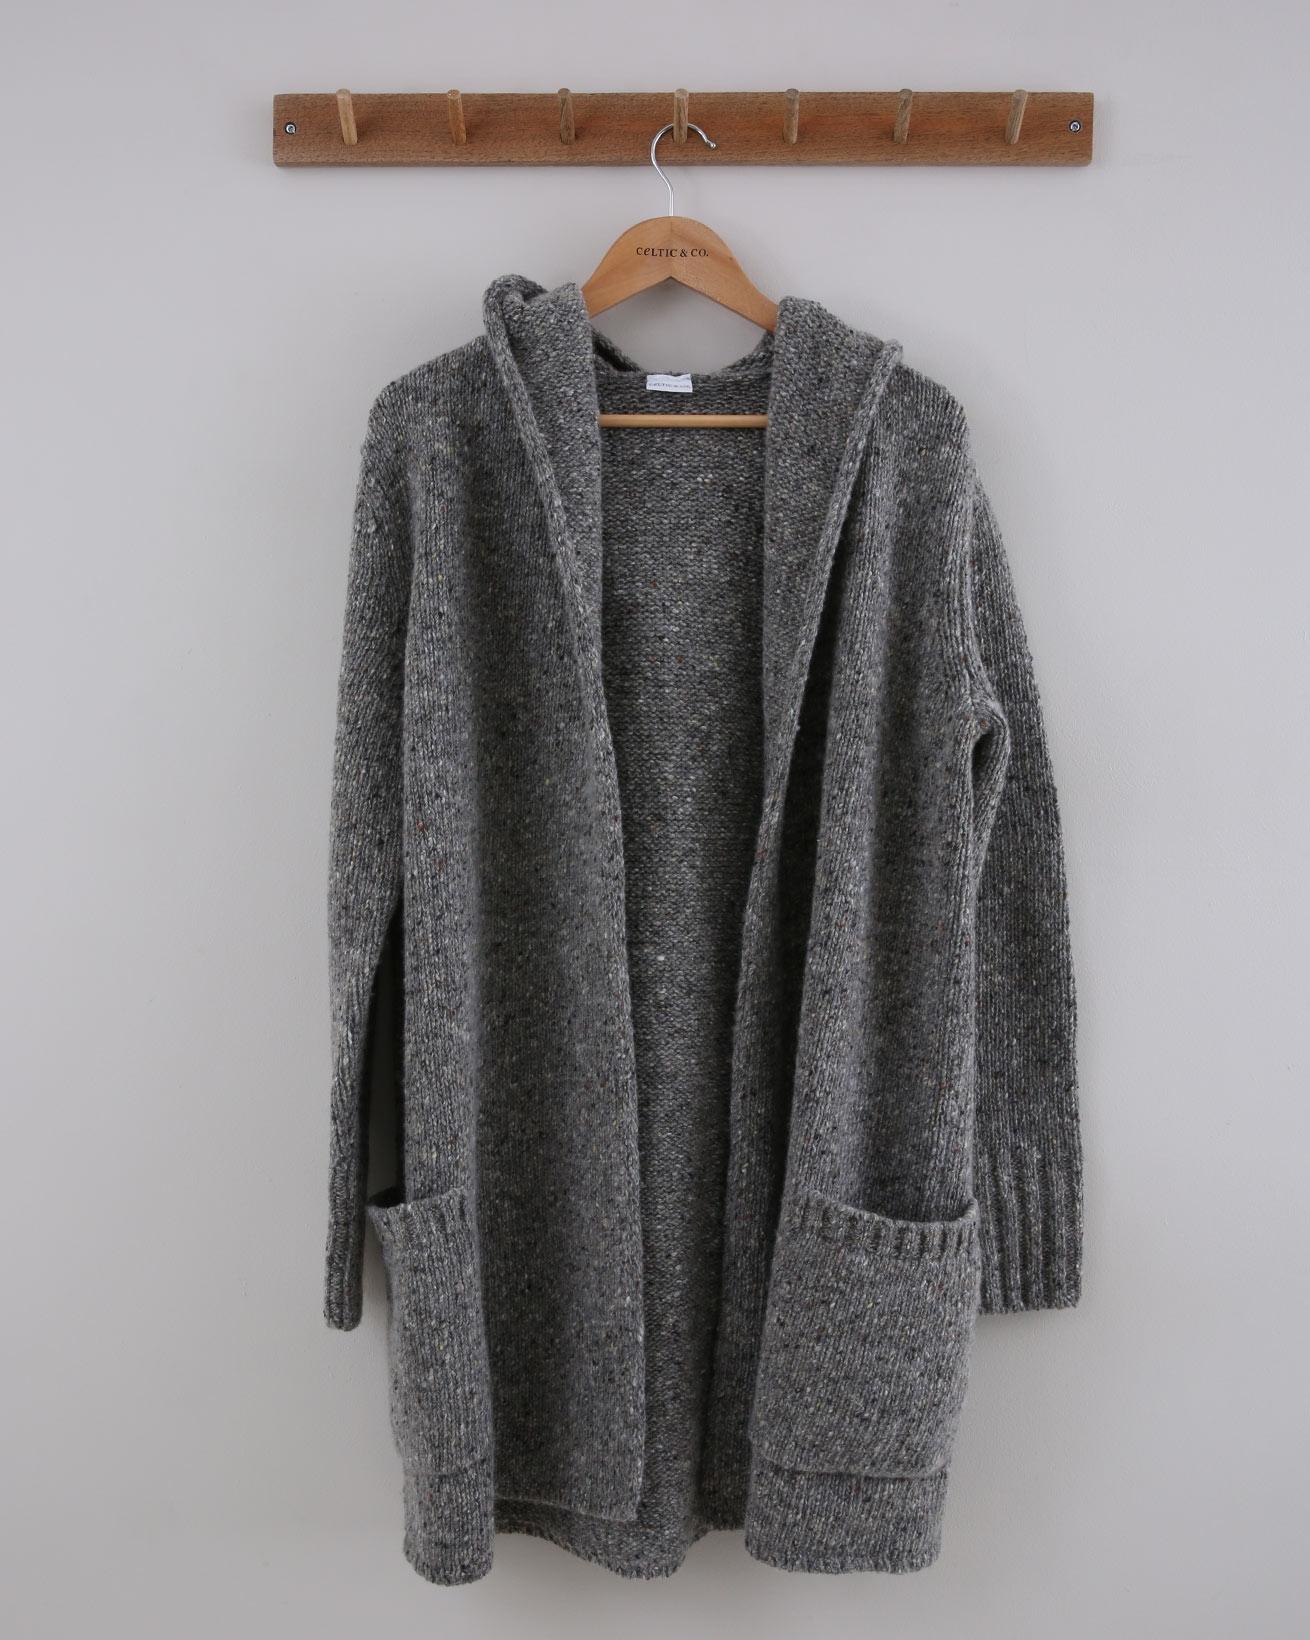 Donegal Hooded Coatigan - Size Medium - Grey Pebble - 1512